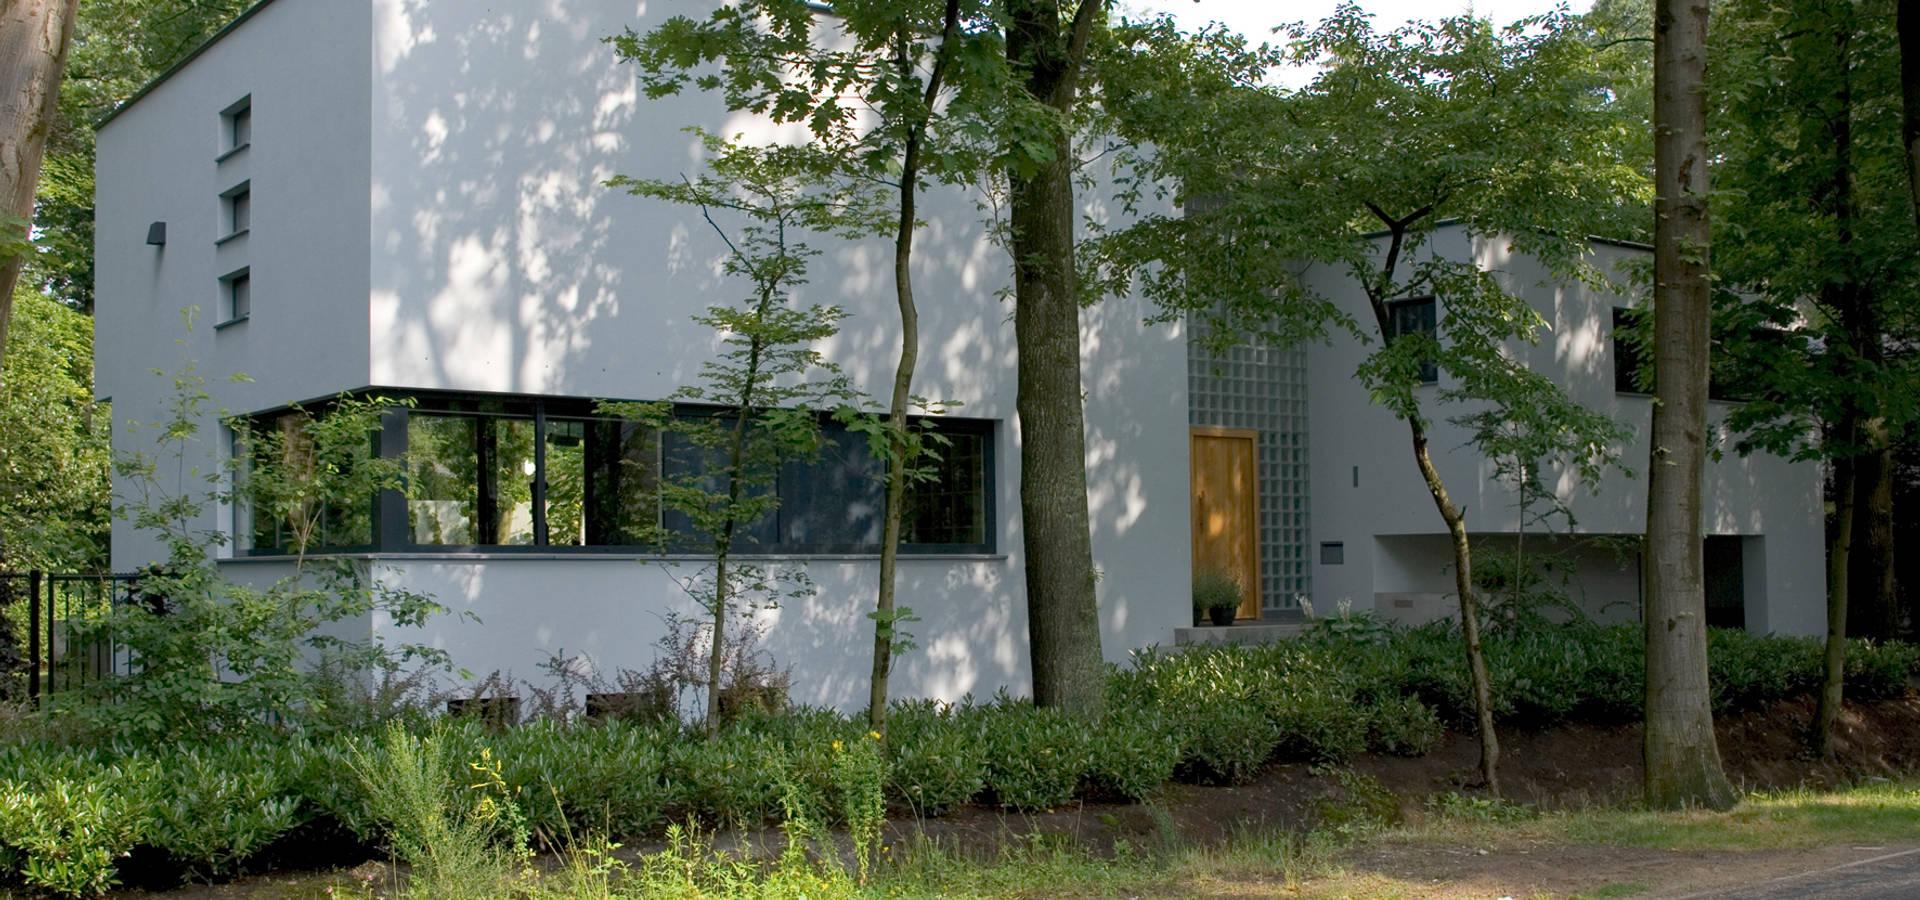 Woning berkel enschot door doreth eijkens interieur architectuur homify - Huis interieur architectuur ...